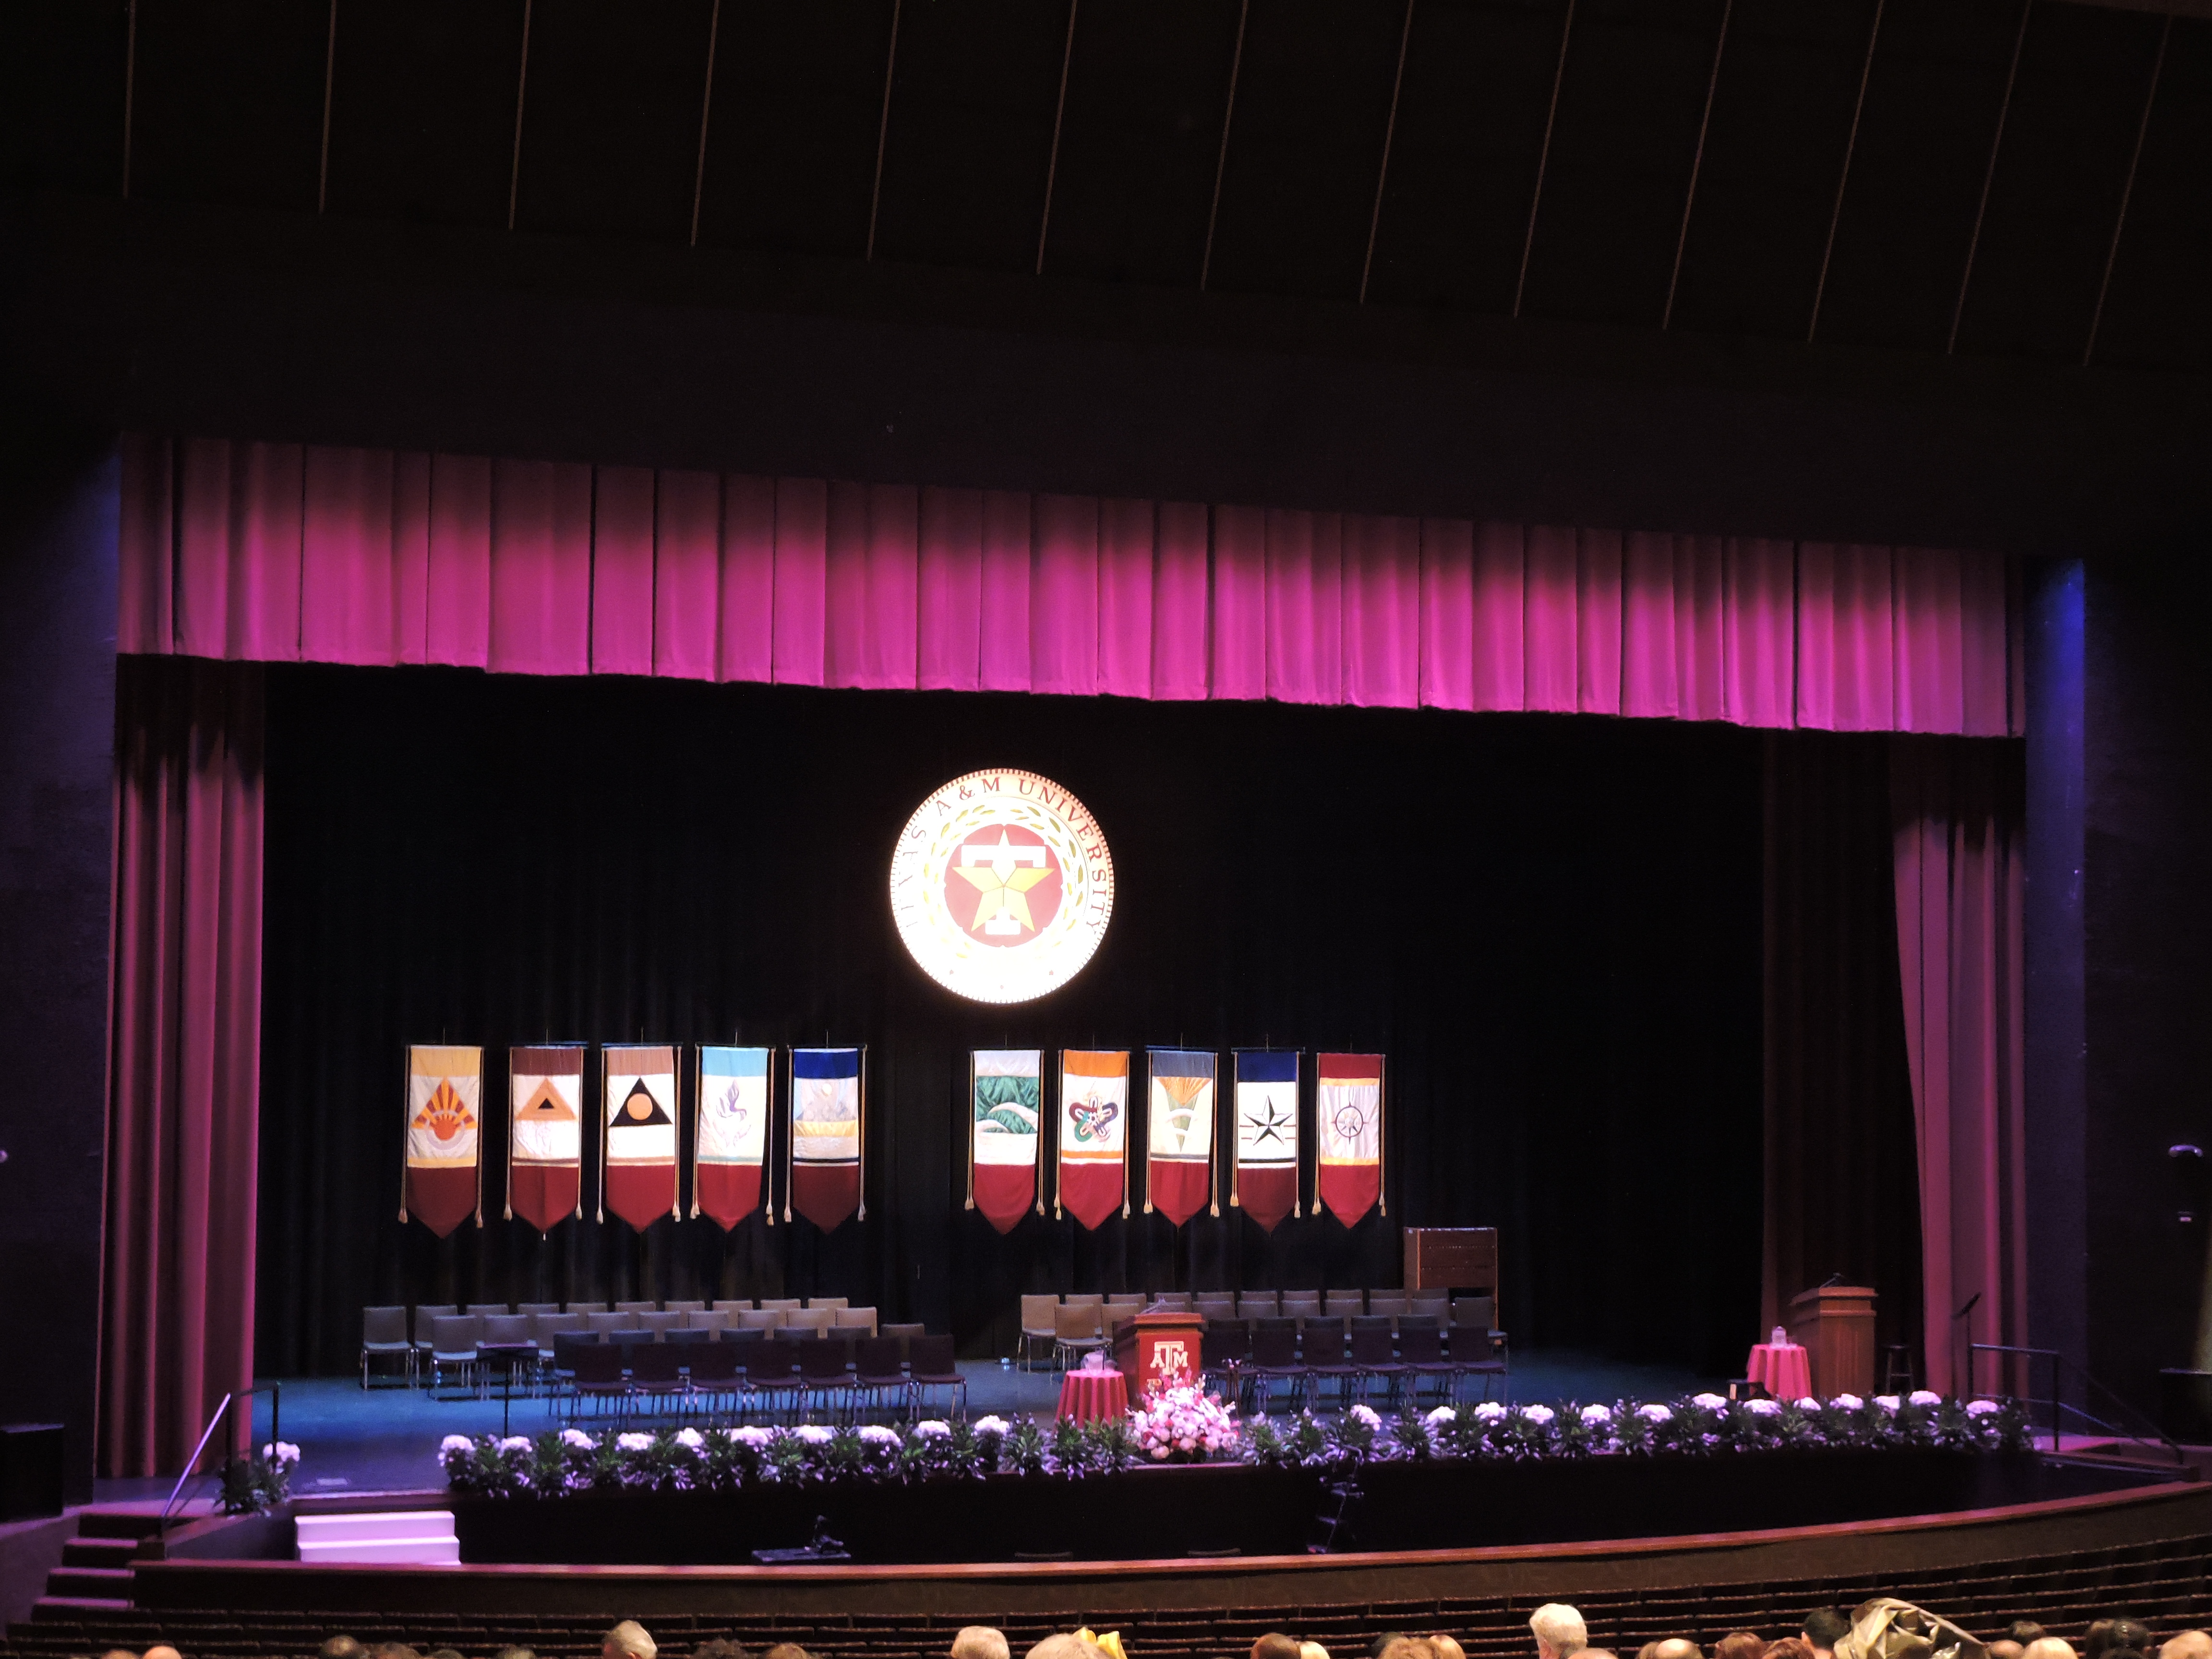 Graduation Ceremony at A&M